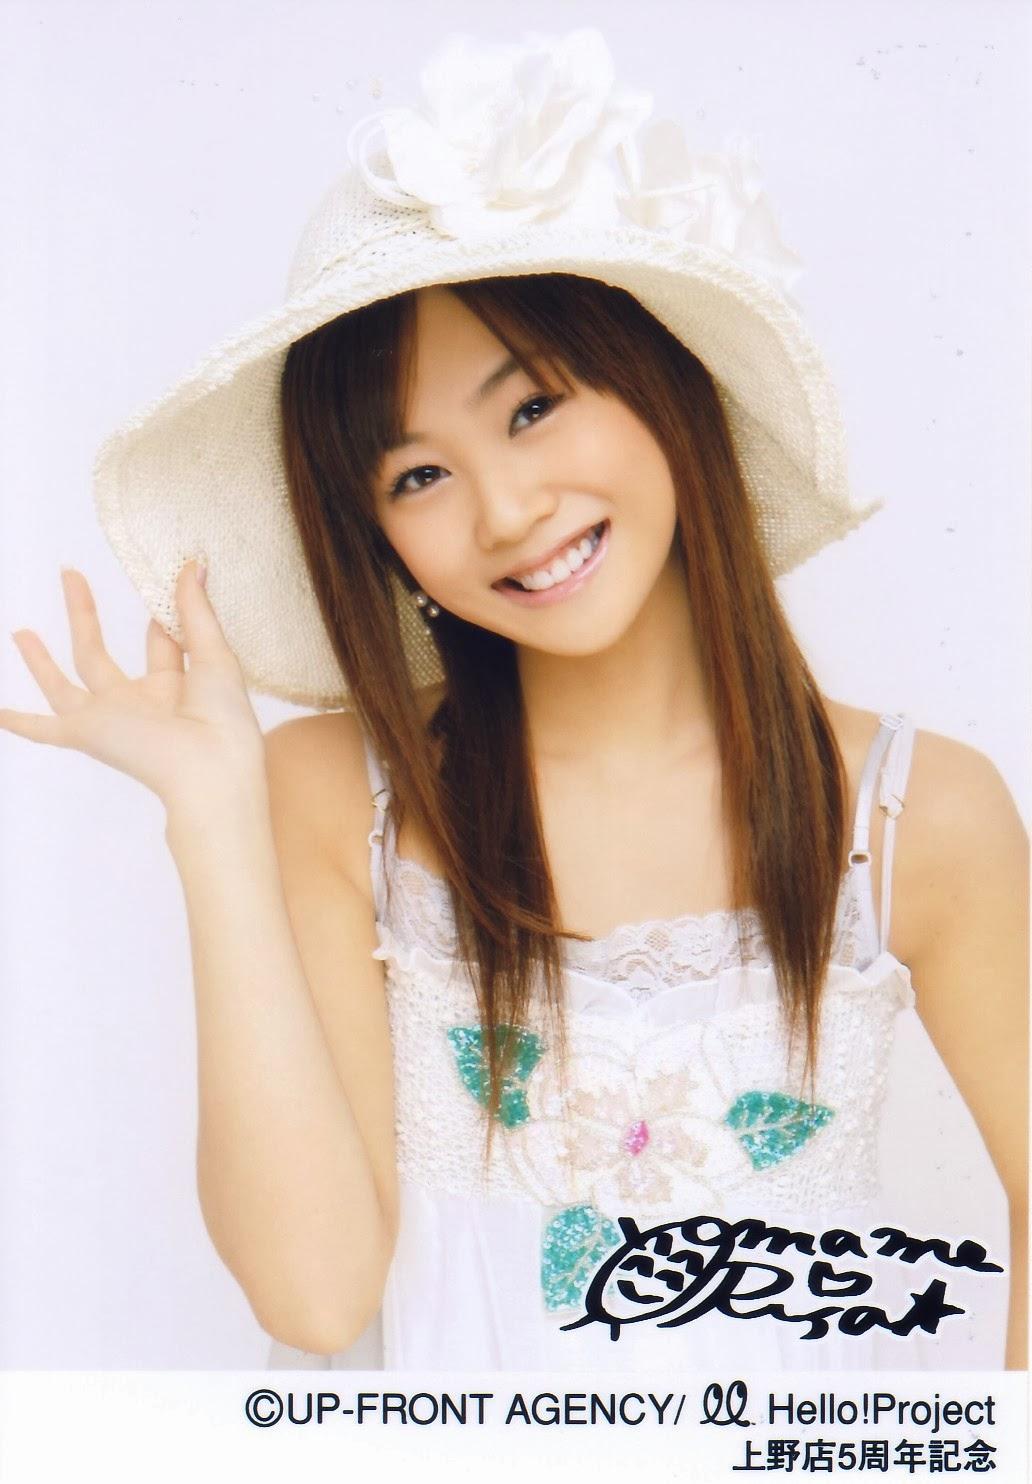 Morning Musume (5th Gen) - Niigaki Risa